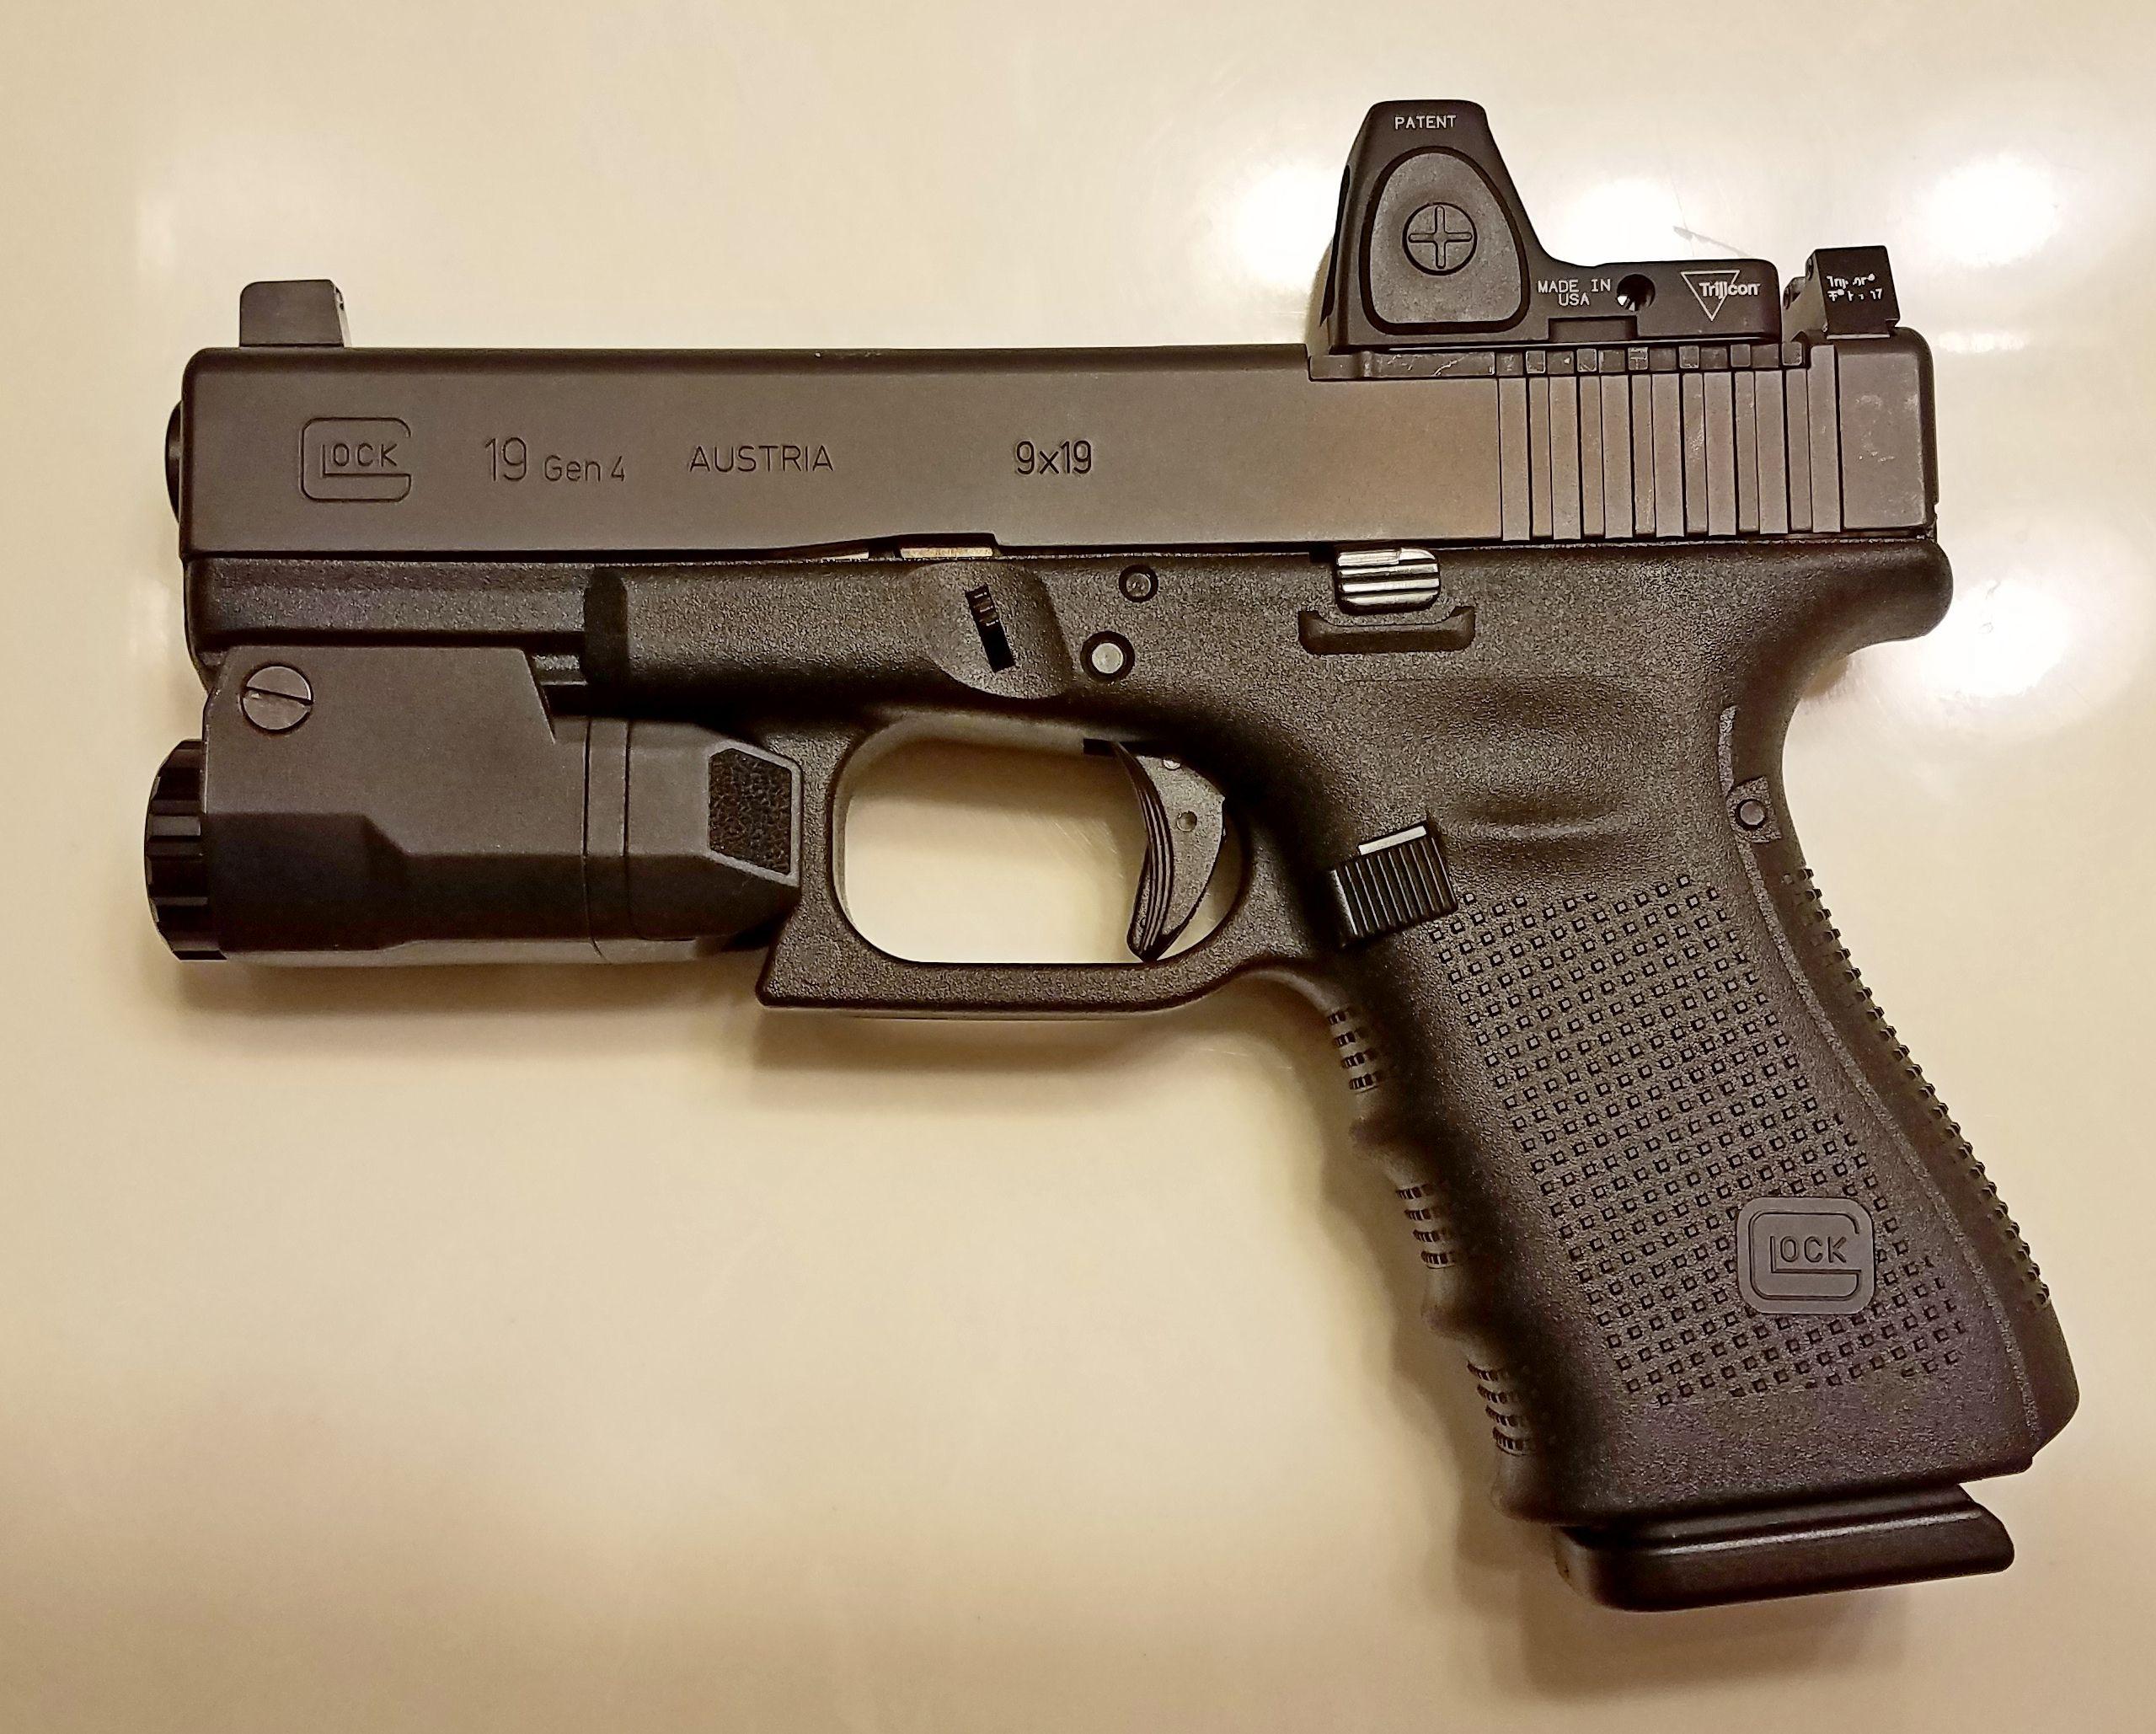 Glock 19 MOS Gen4 with Trijicon RMR Type 2 6 5 MOA, Trijicon